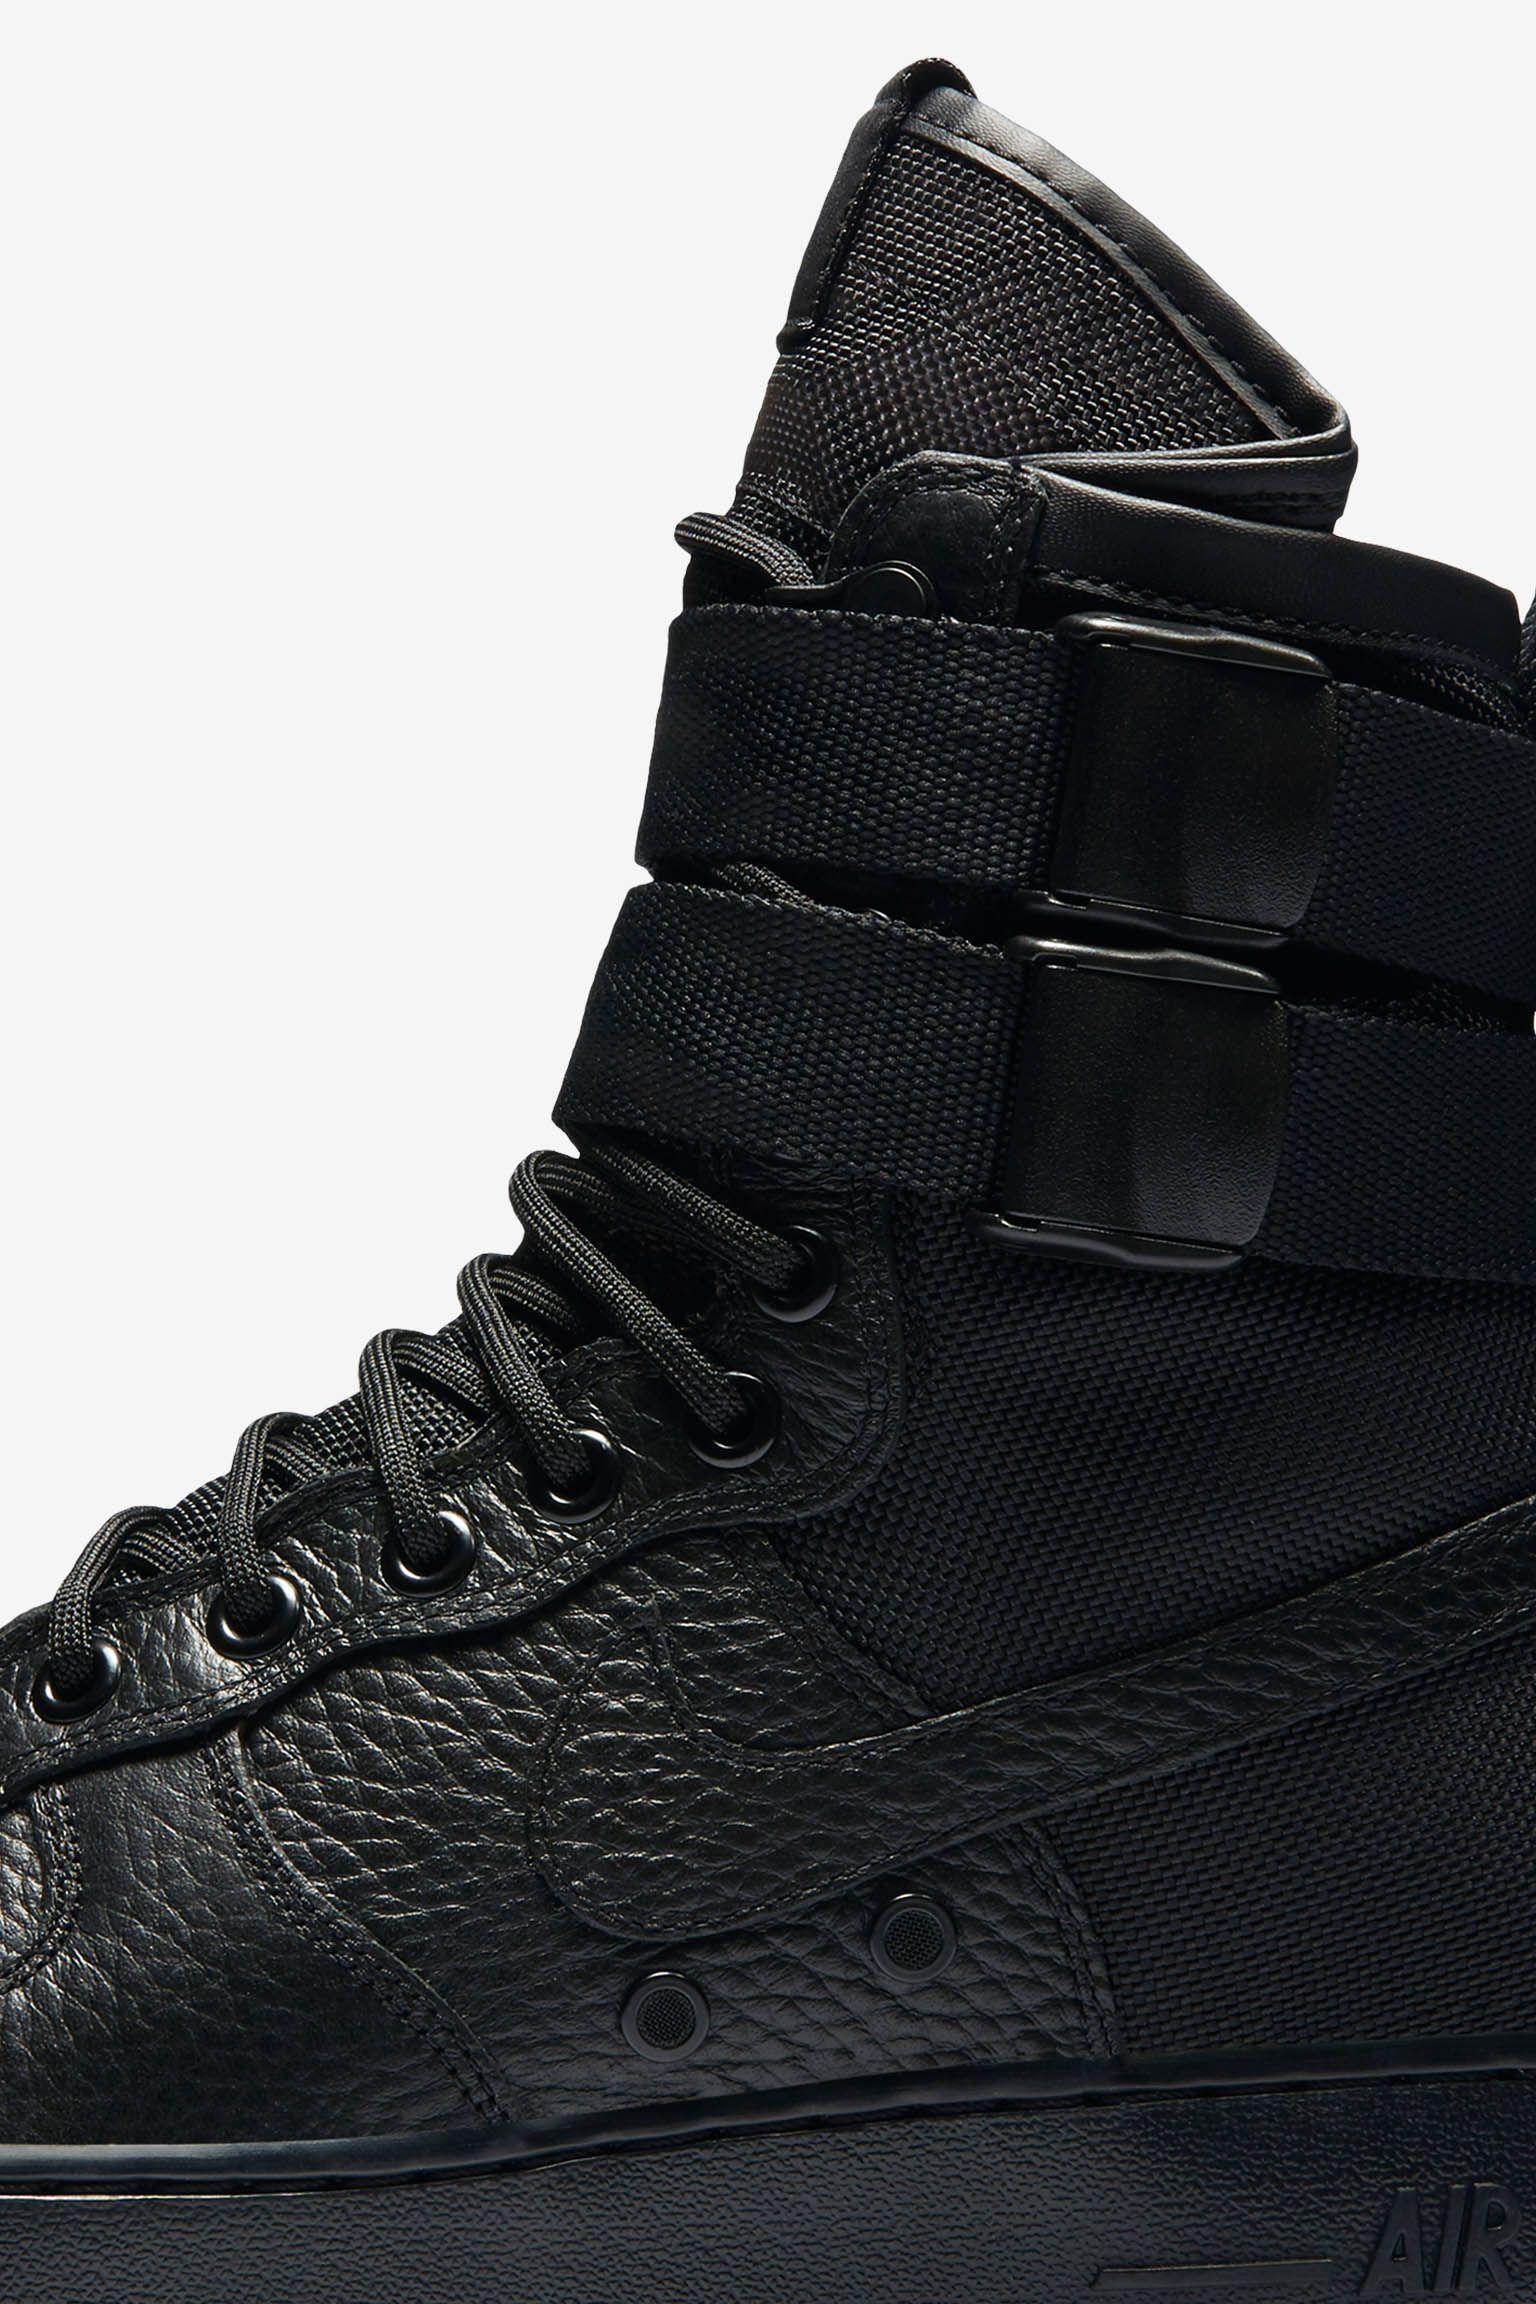 Nike SF AF1 'Black & Gum'